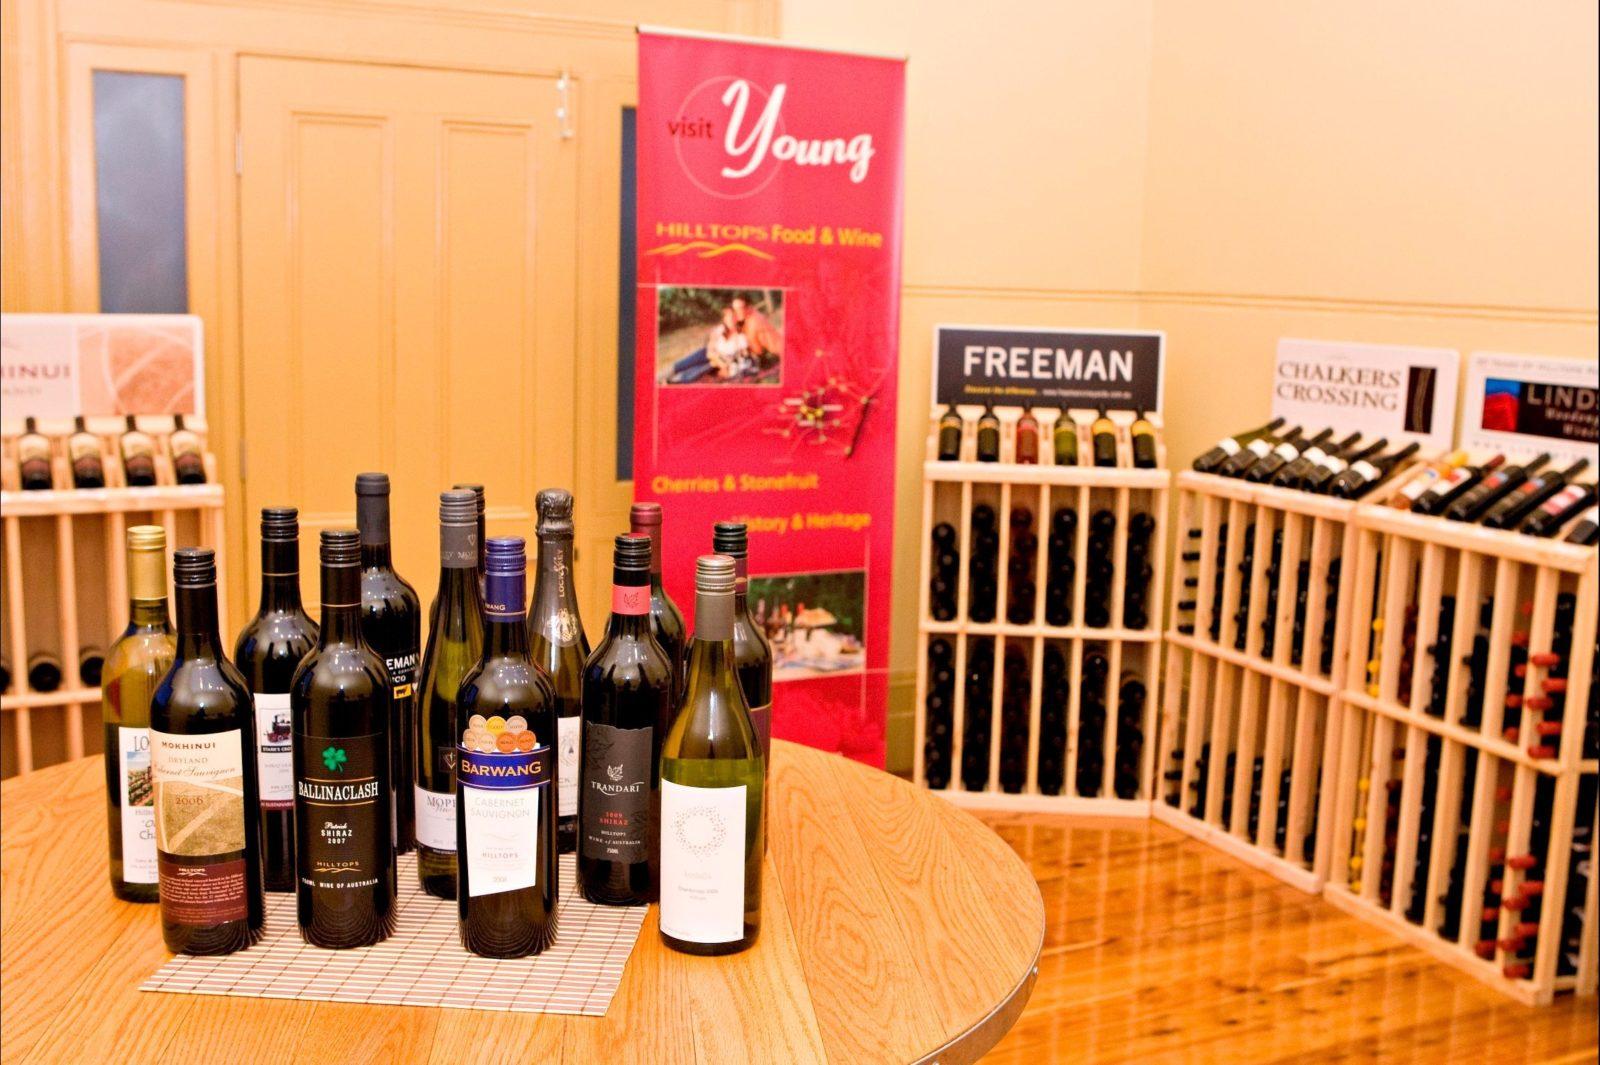 Hilltops Regional Wine Cellar- Young Visitor Information Centre